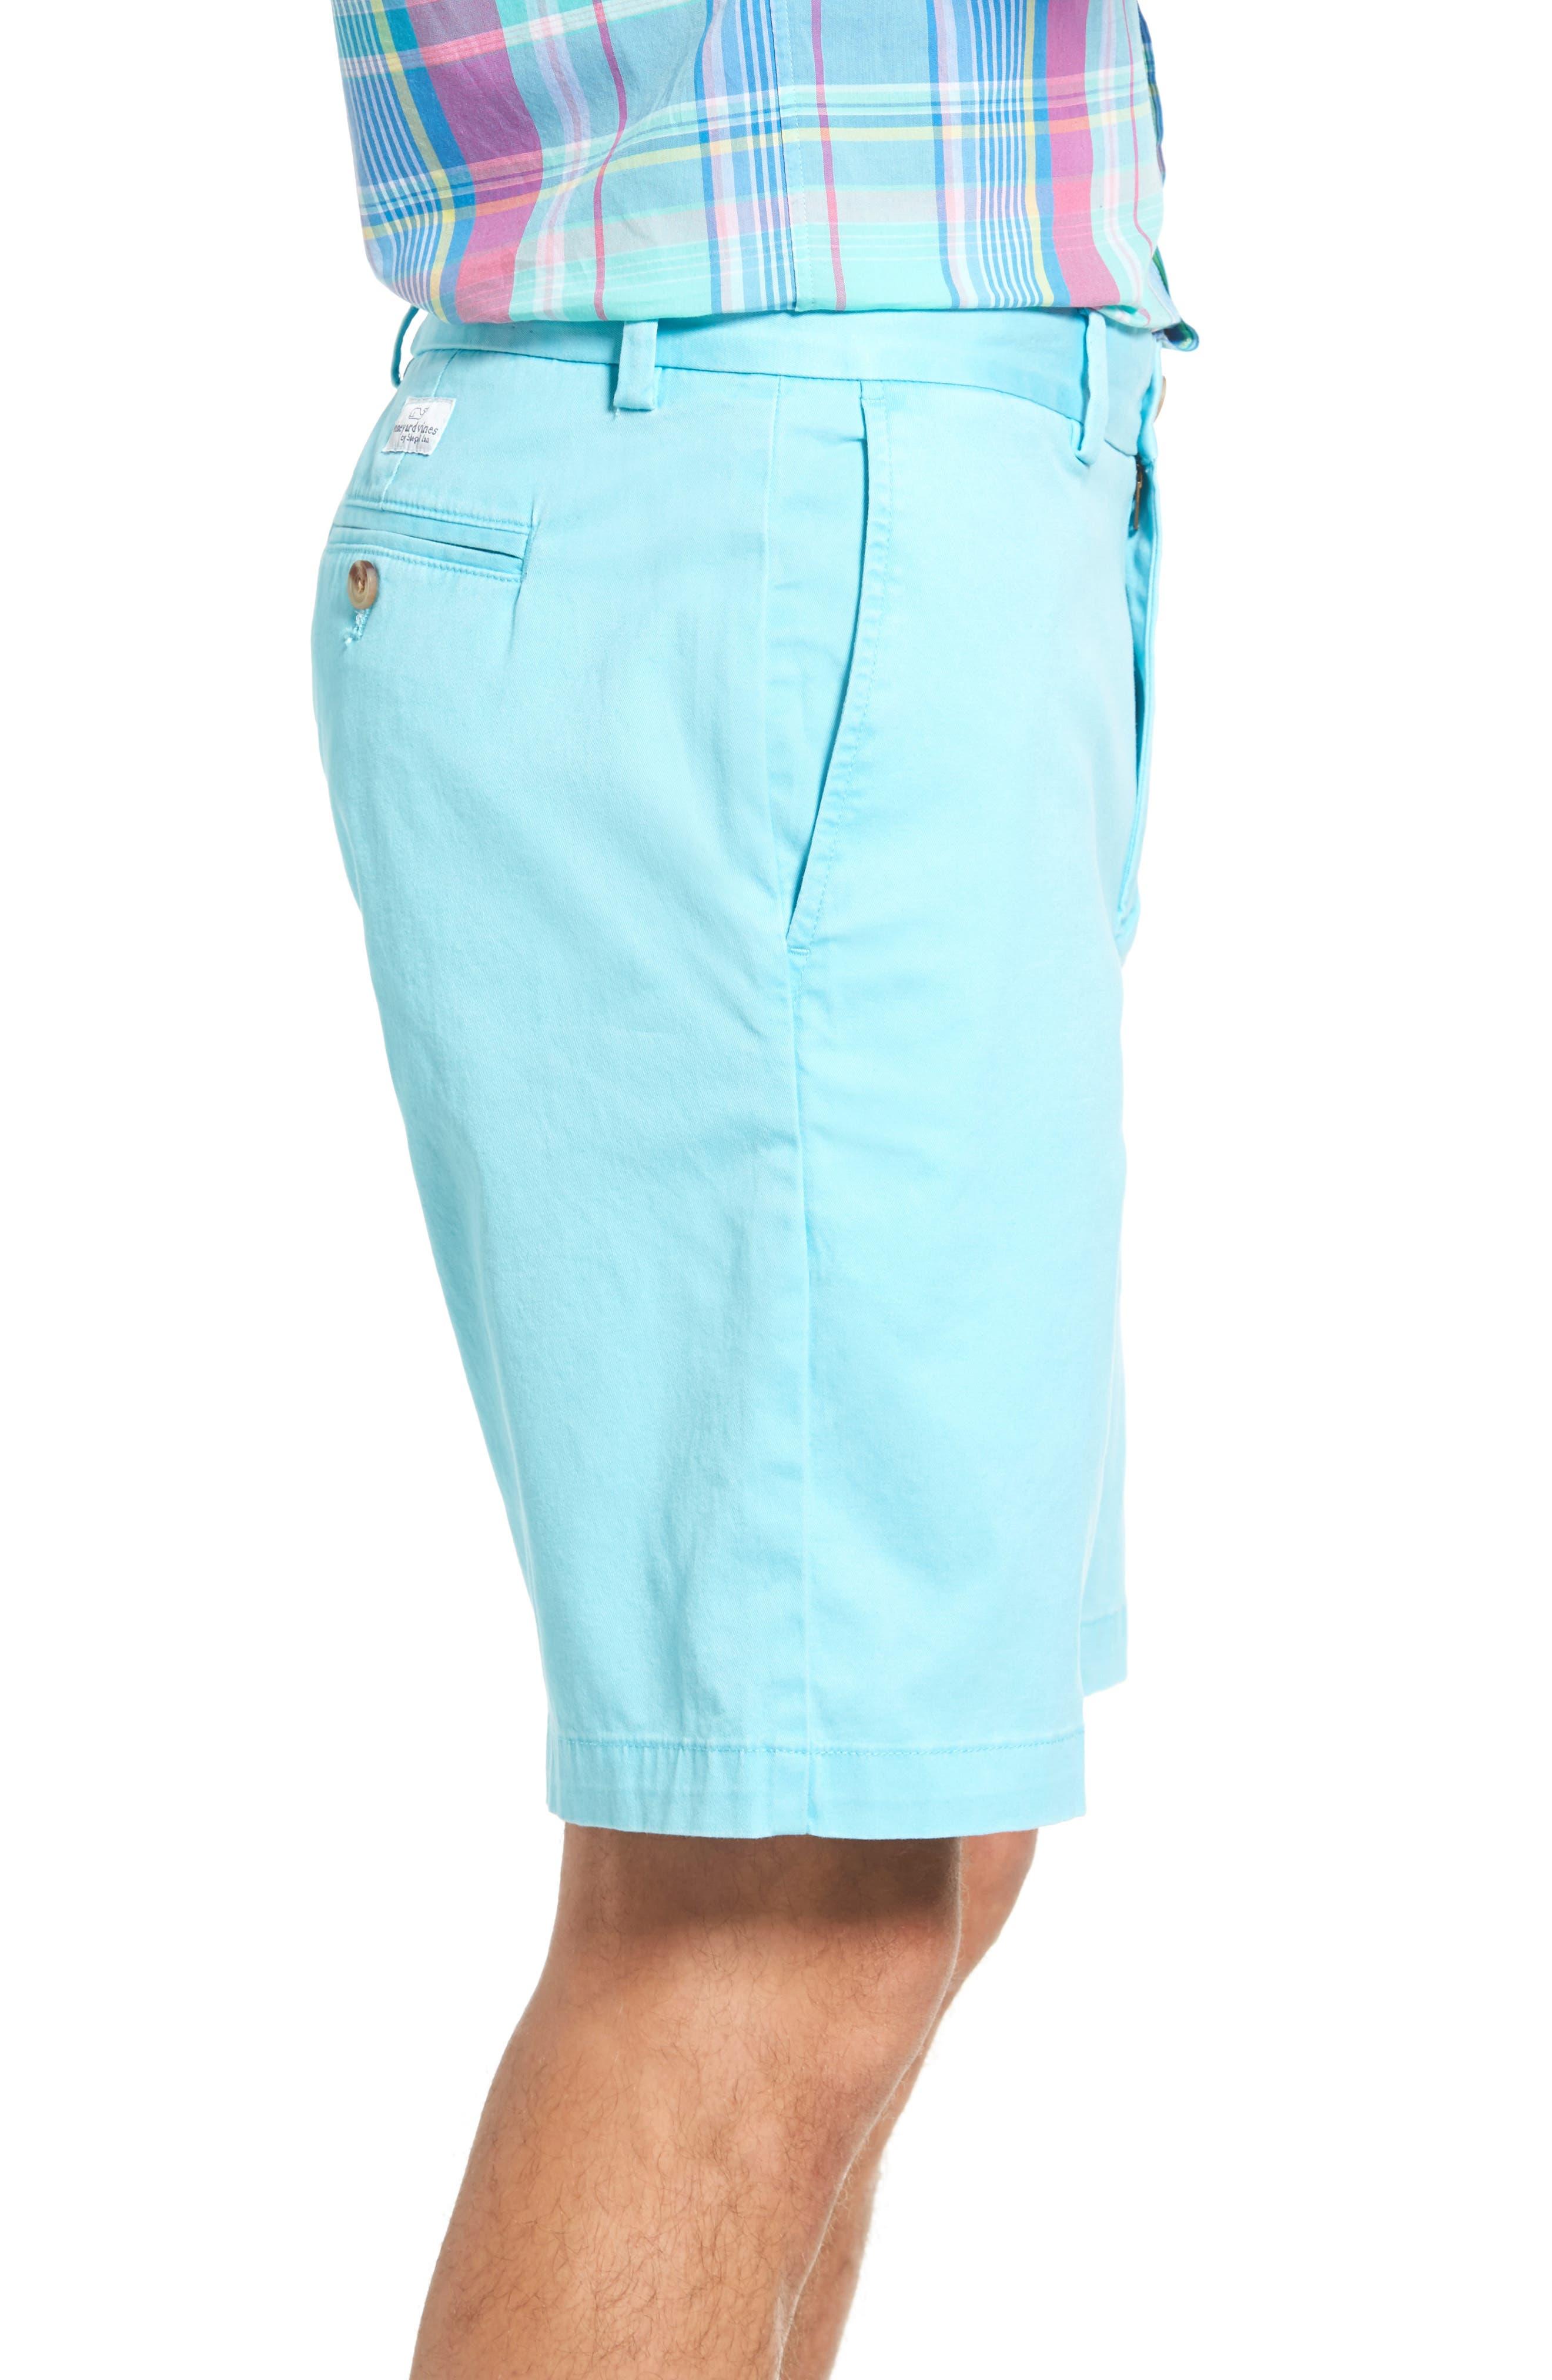 9 Inch Stretch Breaker Shorts,                             Alternate thumbnail 62, color,